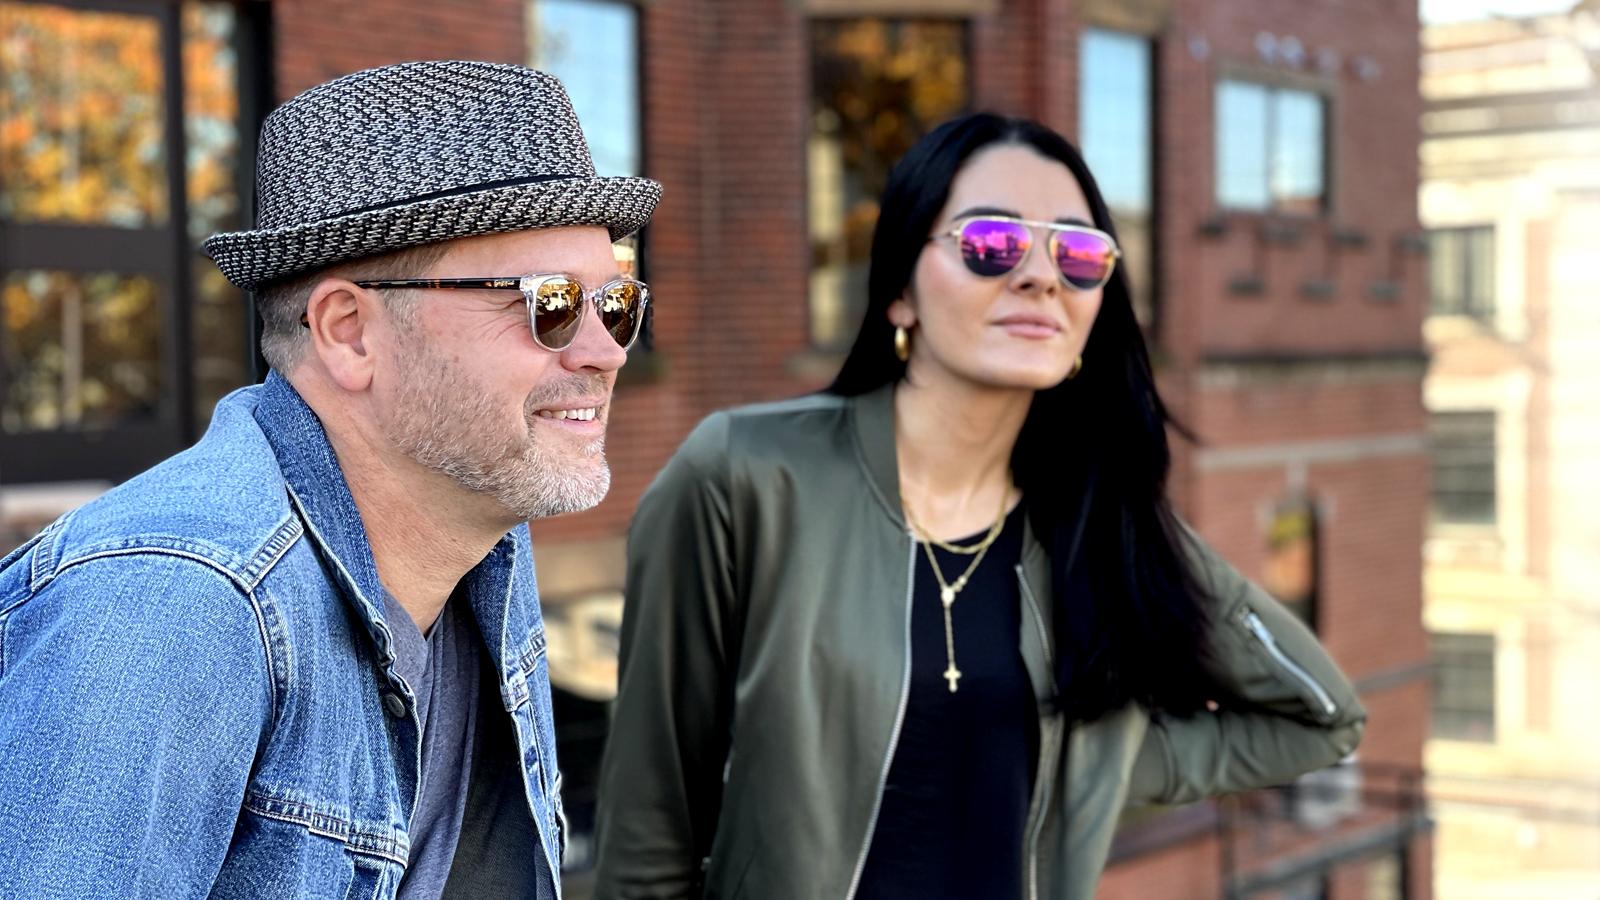 Eyes of Faith Premium Polarized Sunglasses